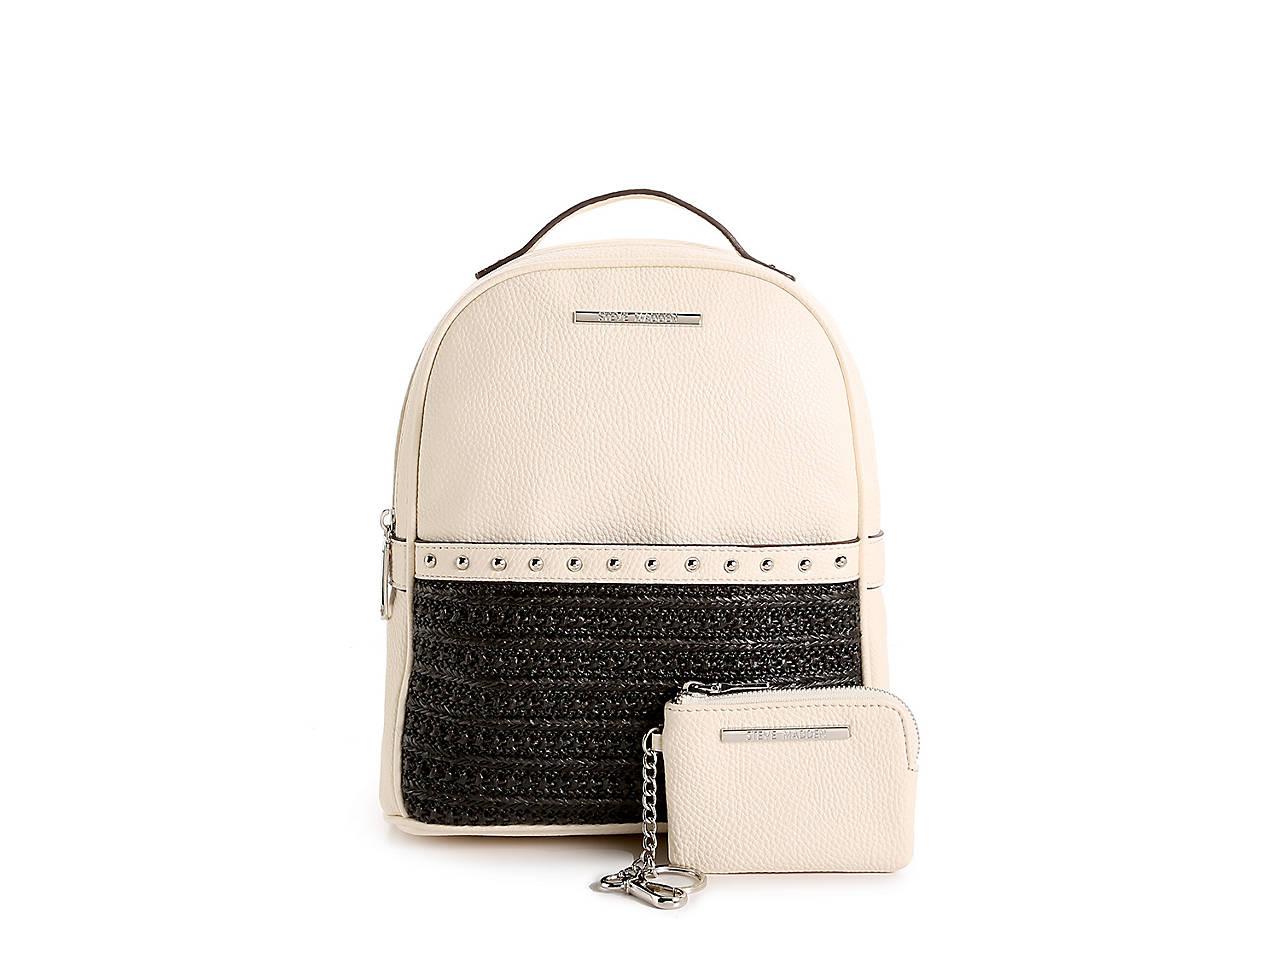 3d8fa45a04 Steve Madden Bstraw Backpack Women's Handbags & Accessories   DSW